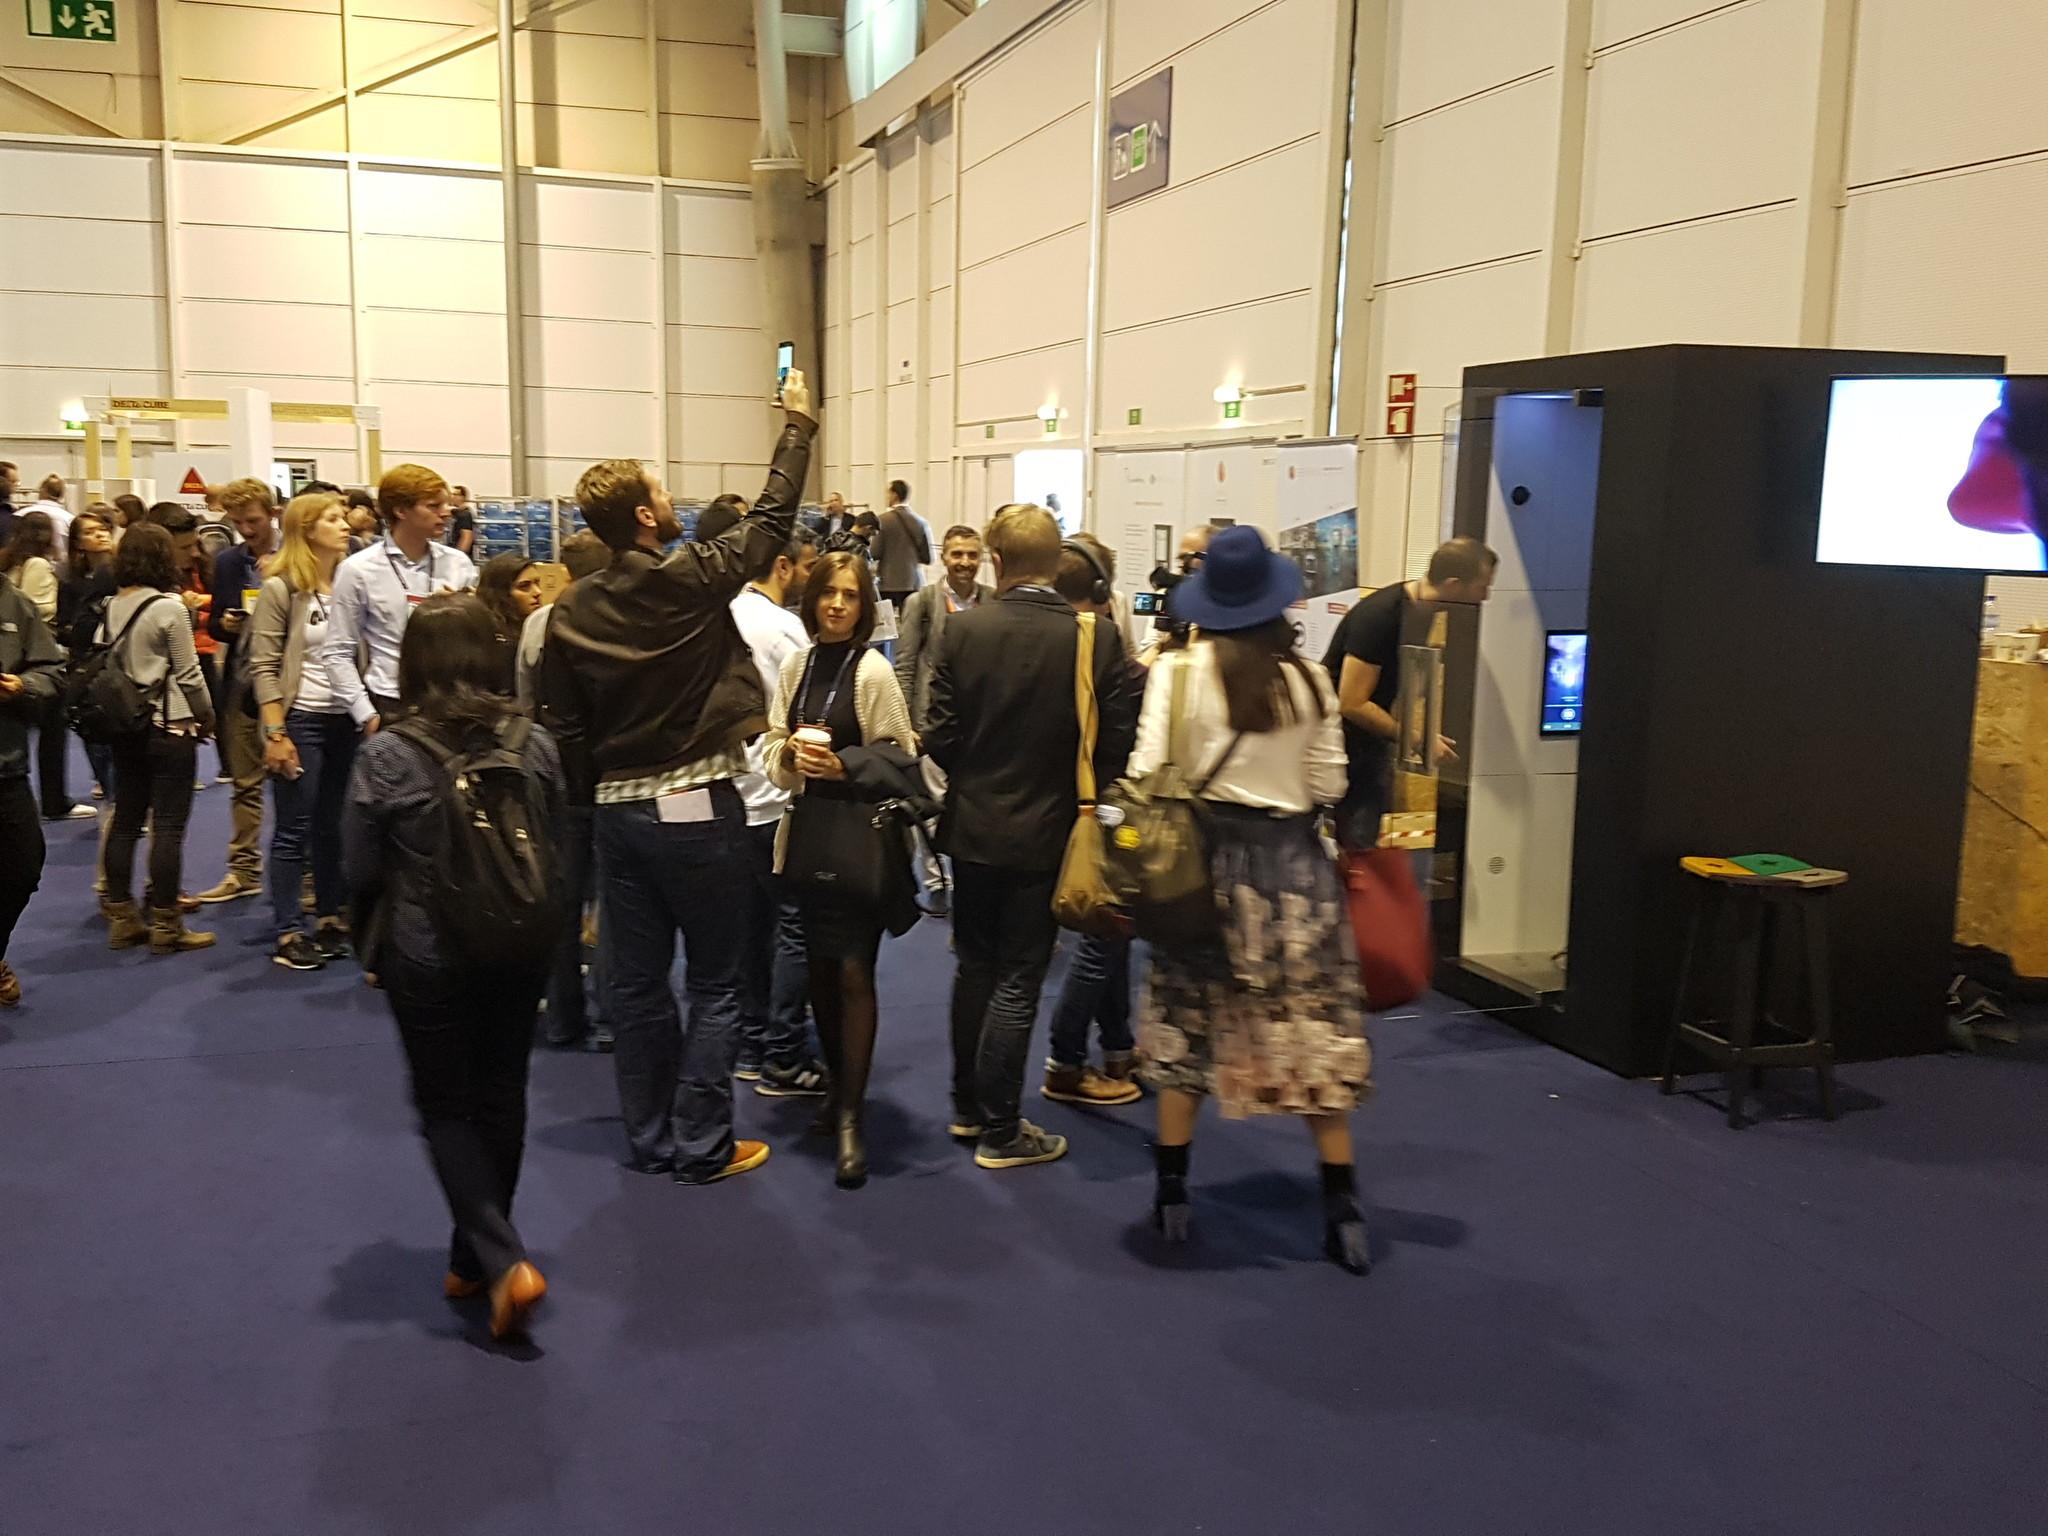 websummit virtual reality augmented reality sensiks event 3